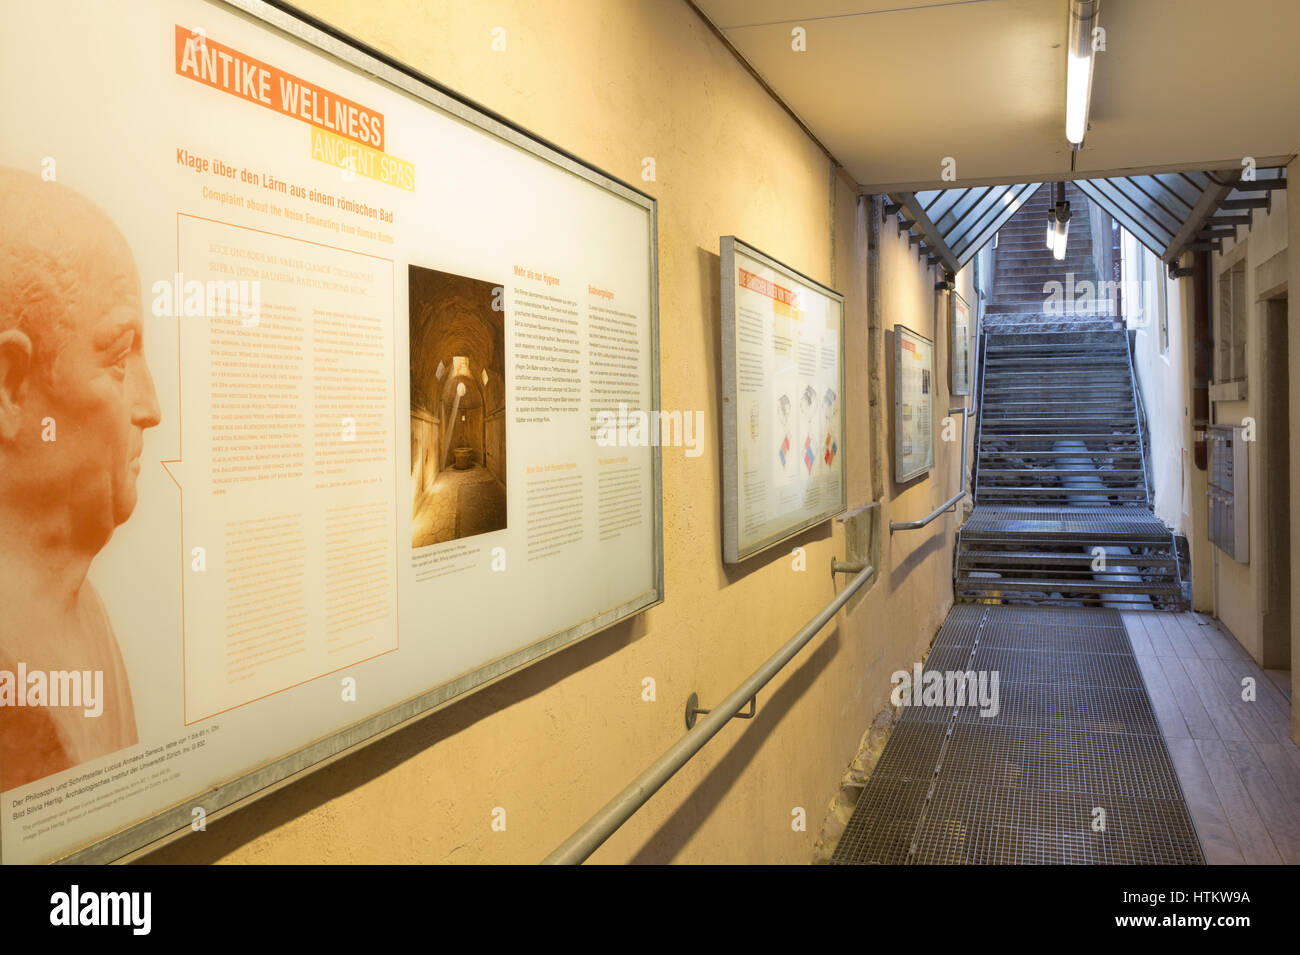 Ancient Spas in Zurich - Stock Image